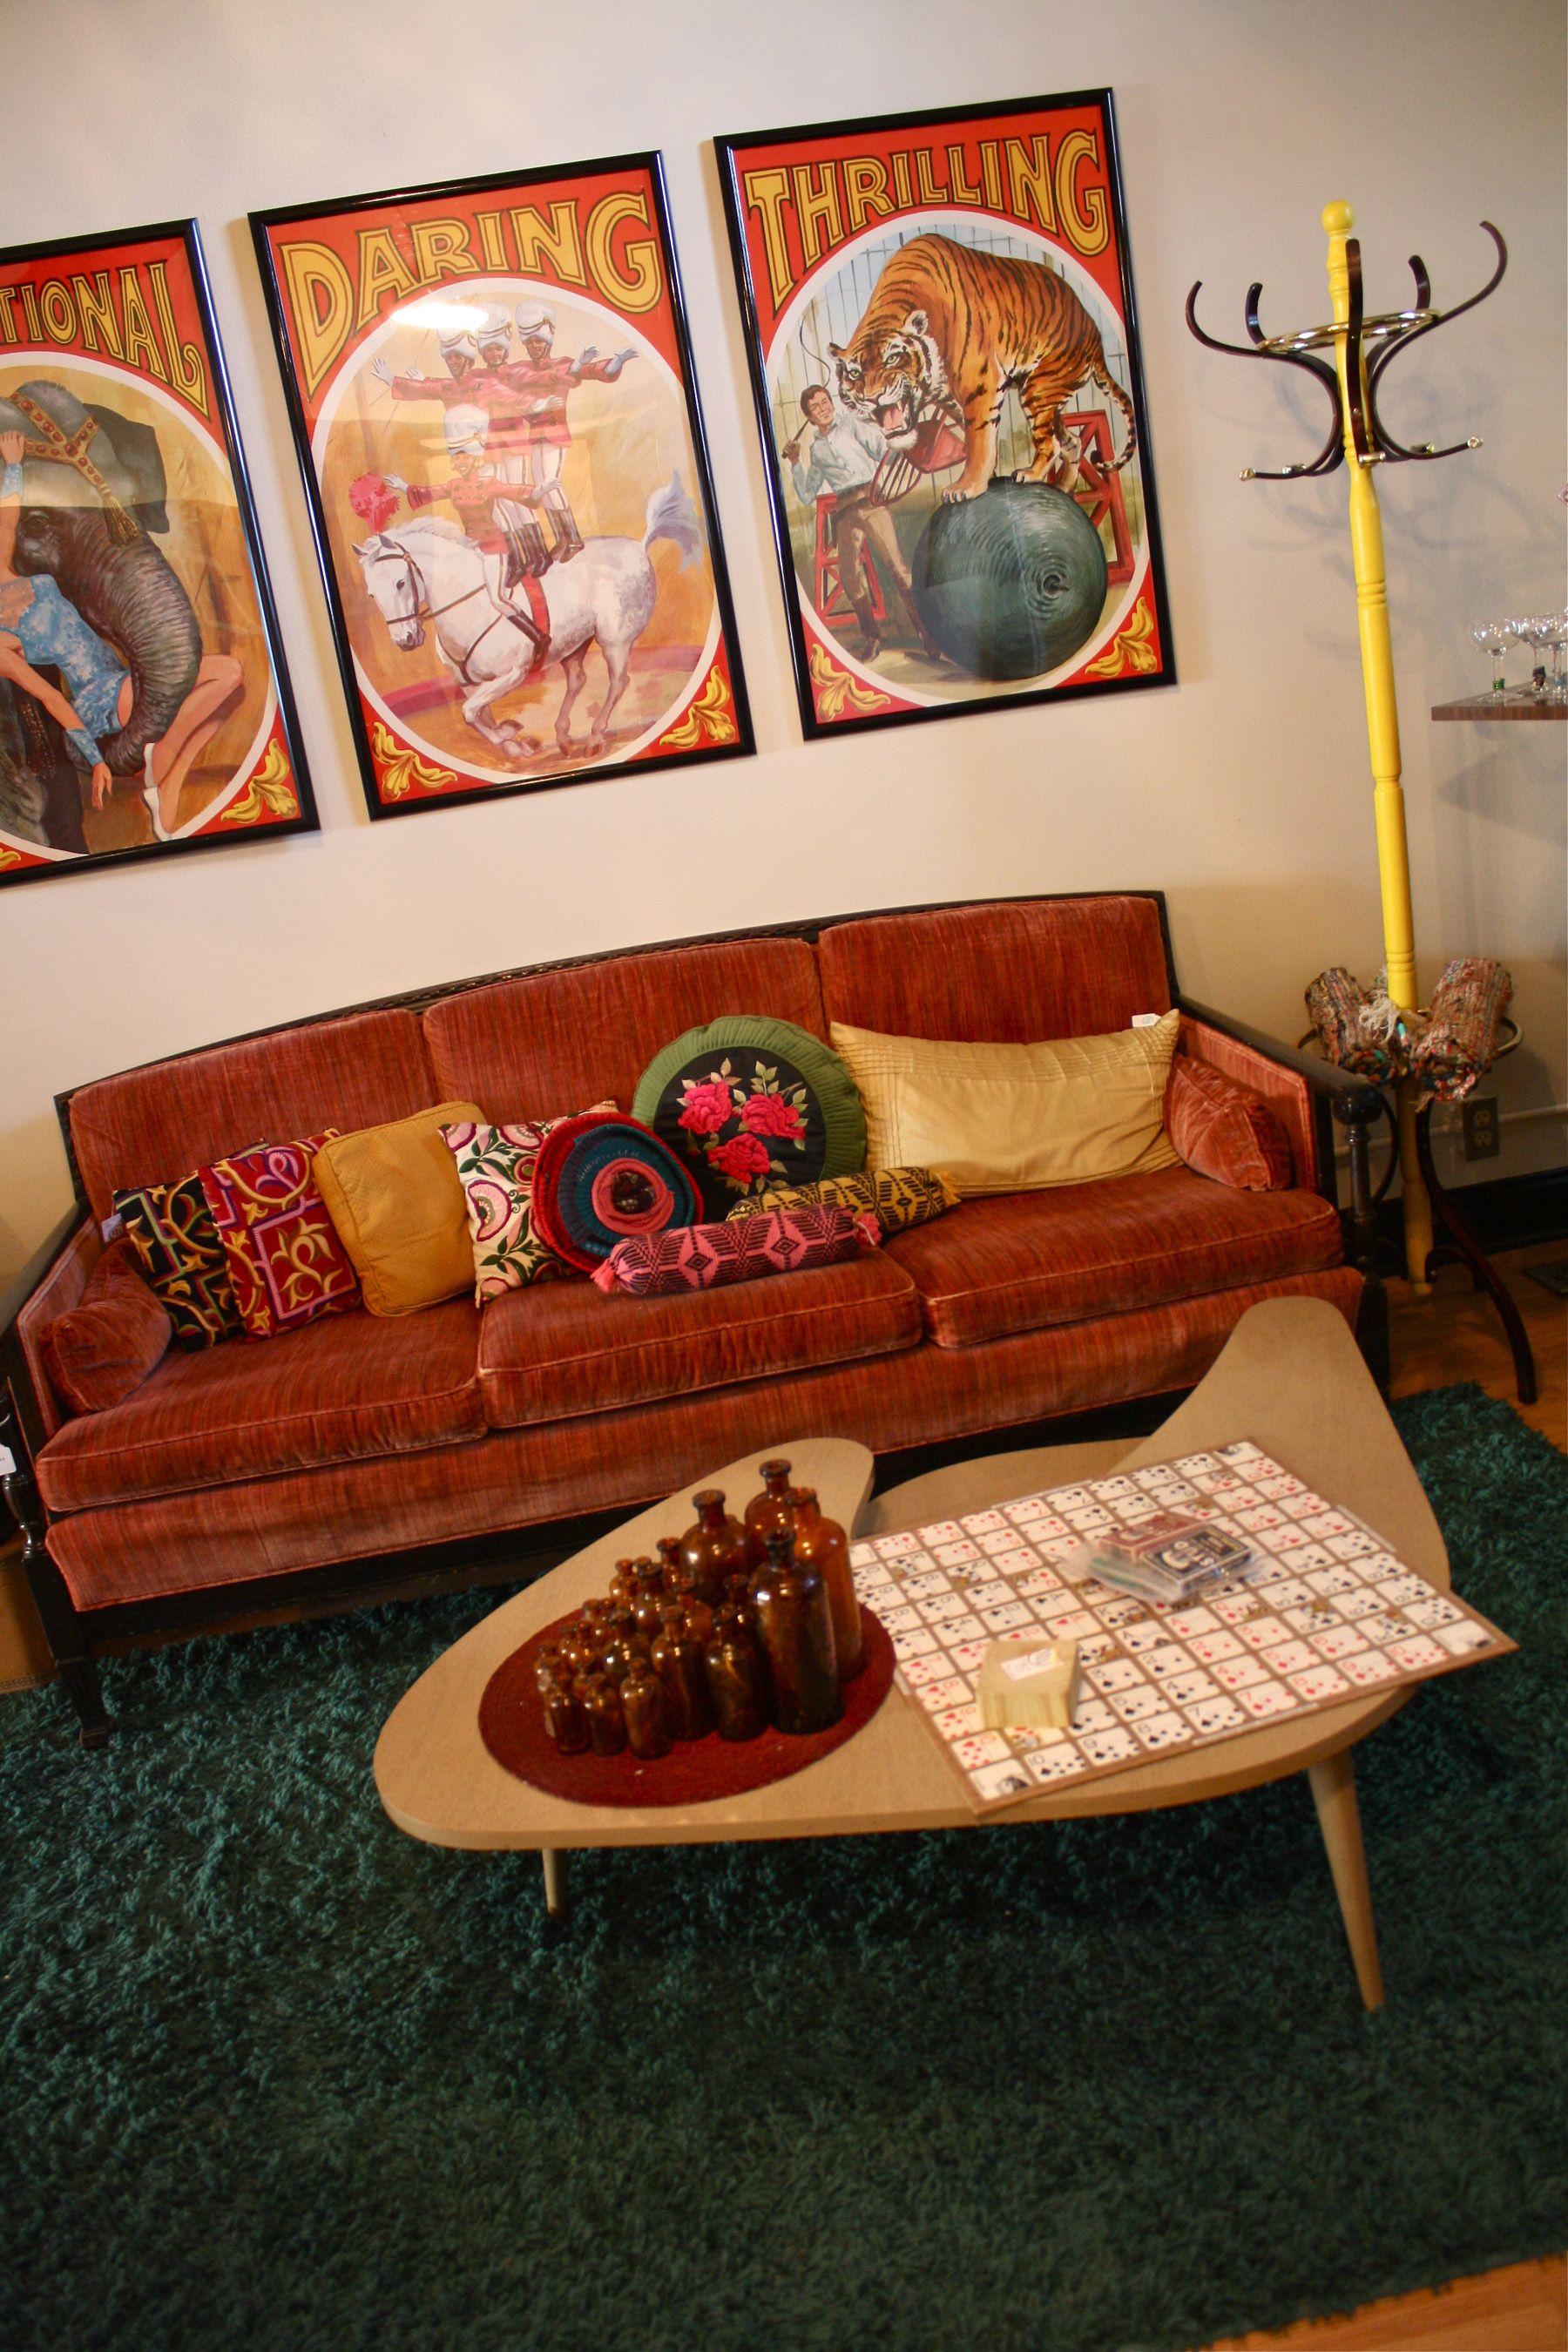 Paperdoll Vintage Boutique Omaha Ne With Furniture Stores In Omaha Nebraska